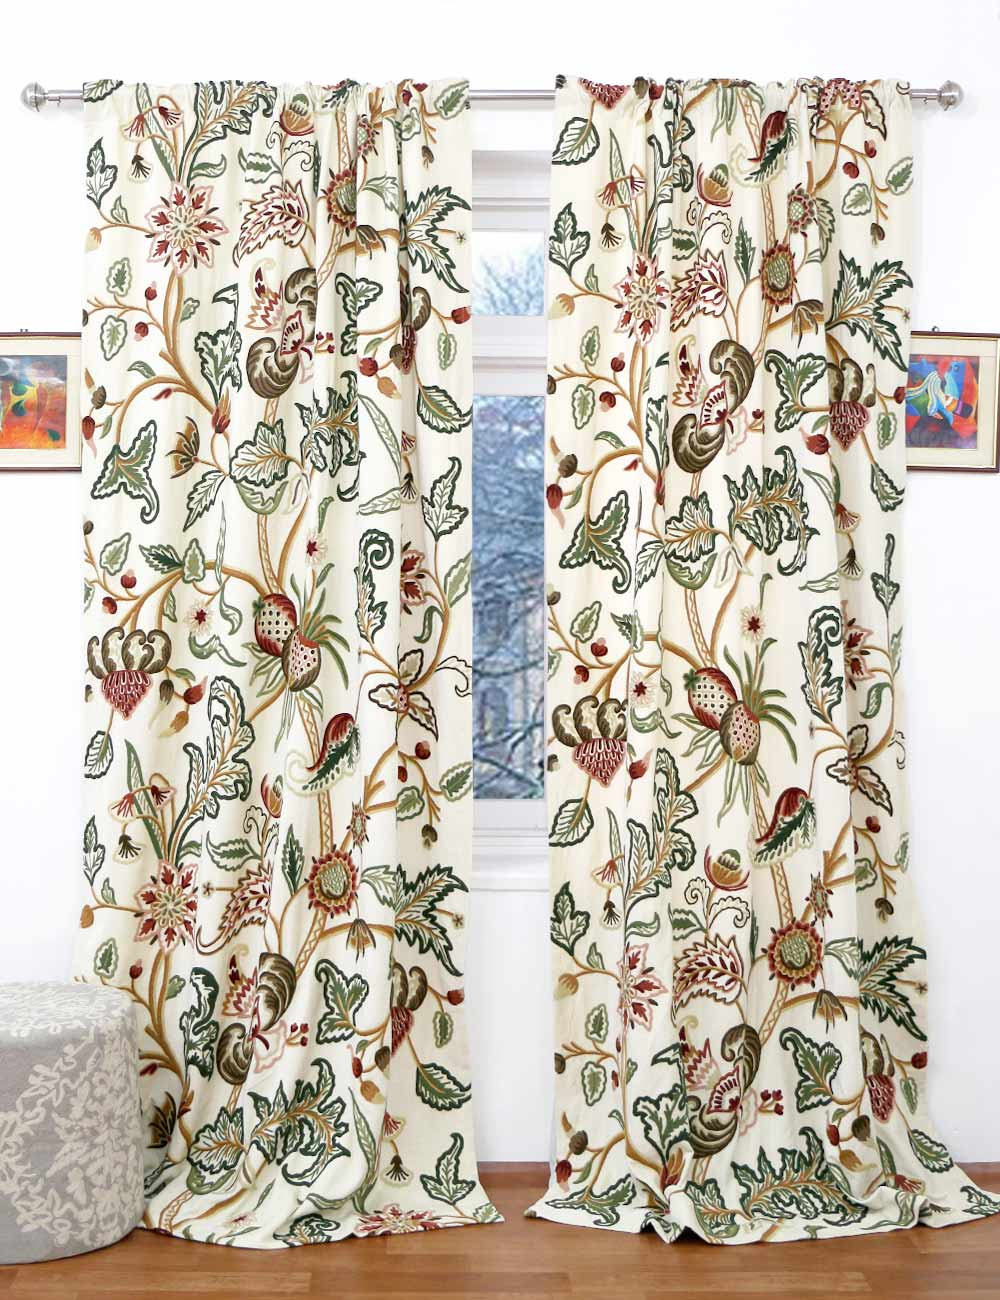 Zanskar Crewel Curtain Panels And Drapes Hand Embroidered